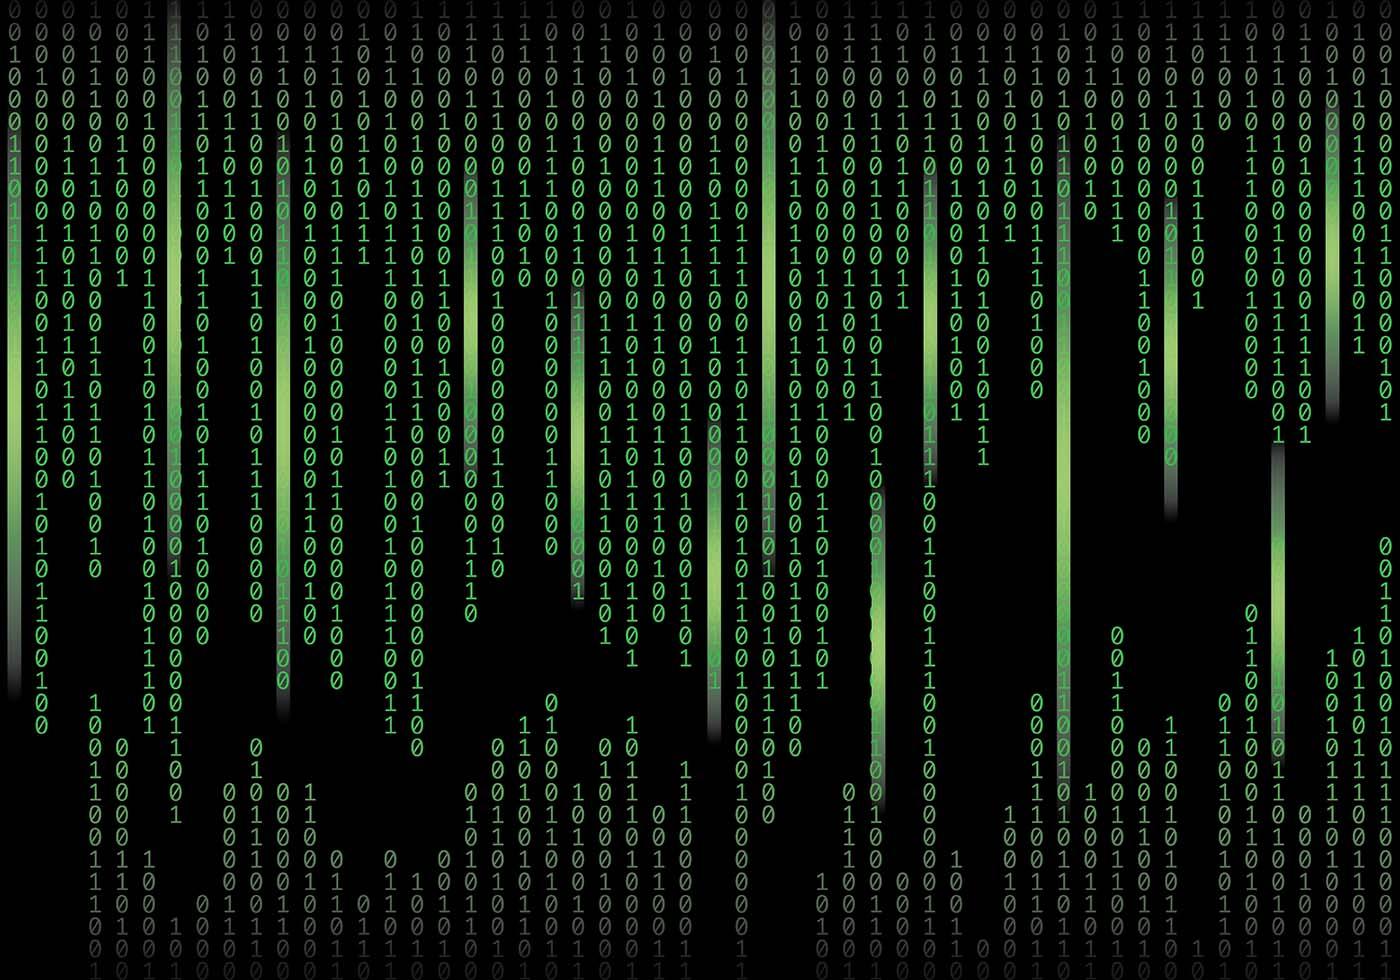 Matrix background vector download free vector art stock - Binary background gif ...